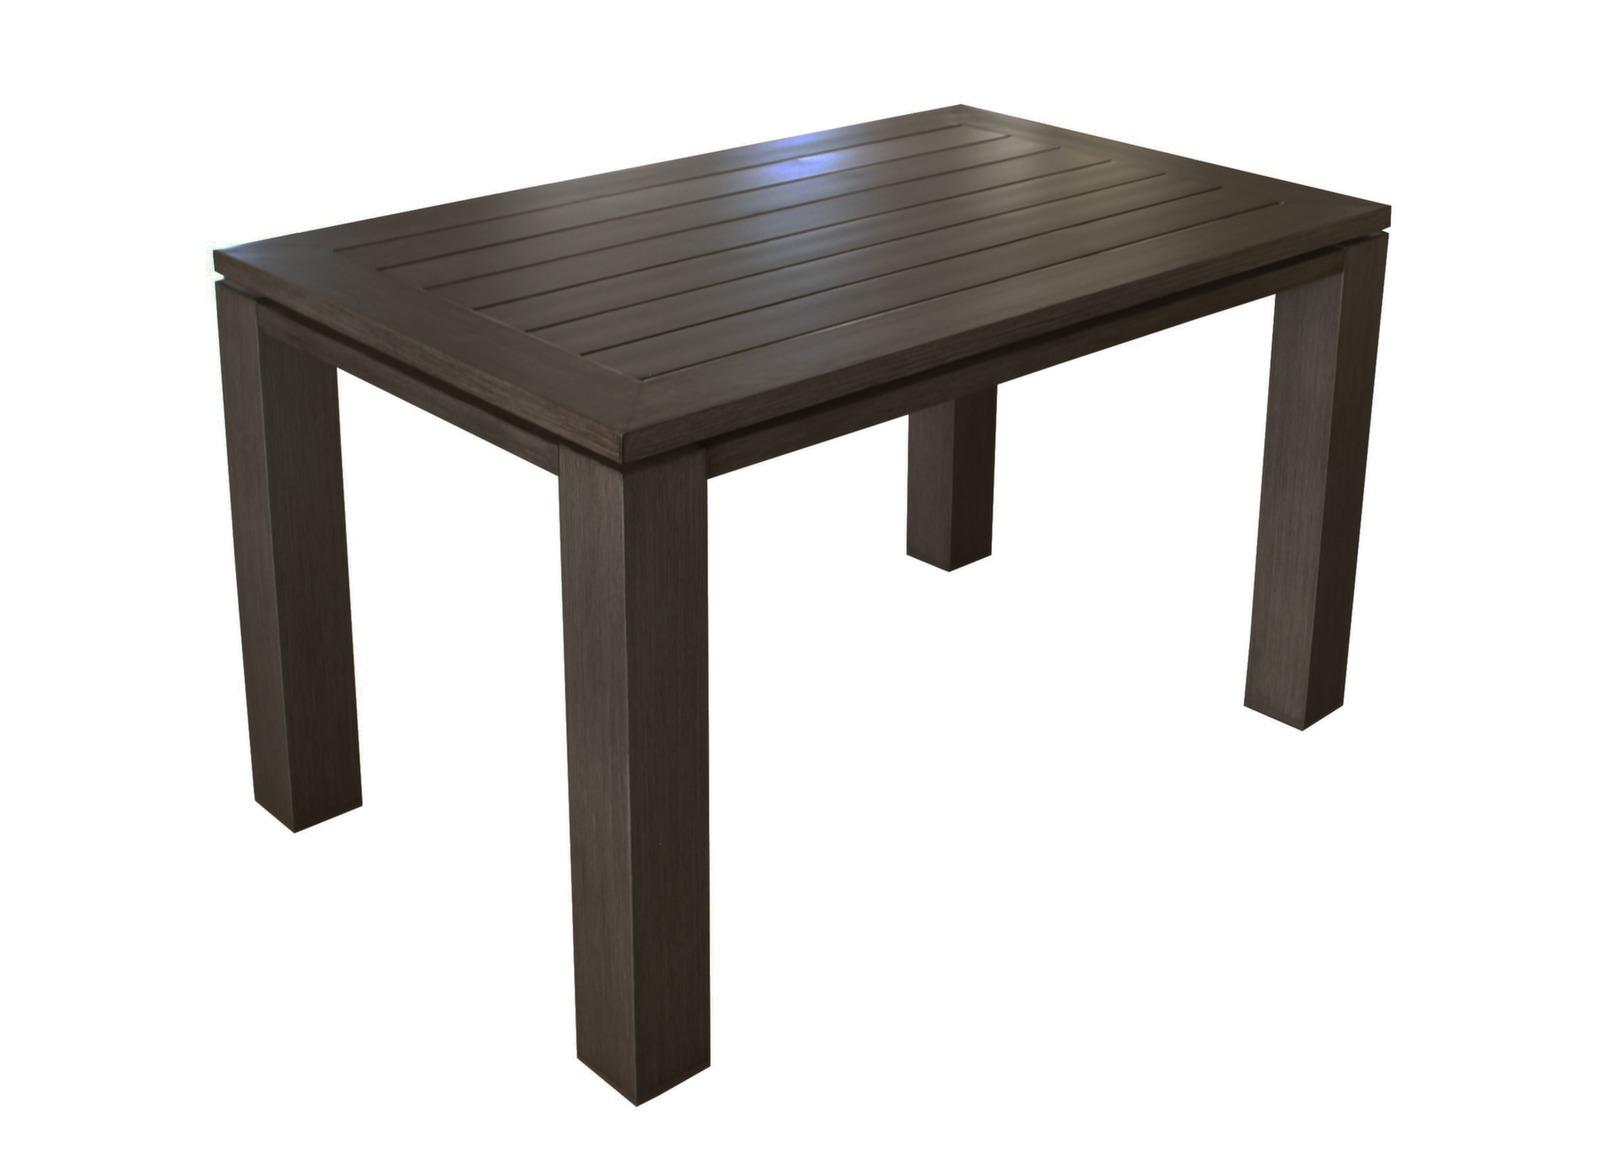 soldes table de jardin latino 120cm oc o proloisirs. Black Bedroom Furniture Sets. Home Design Ideas